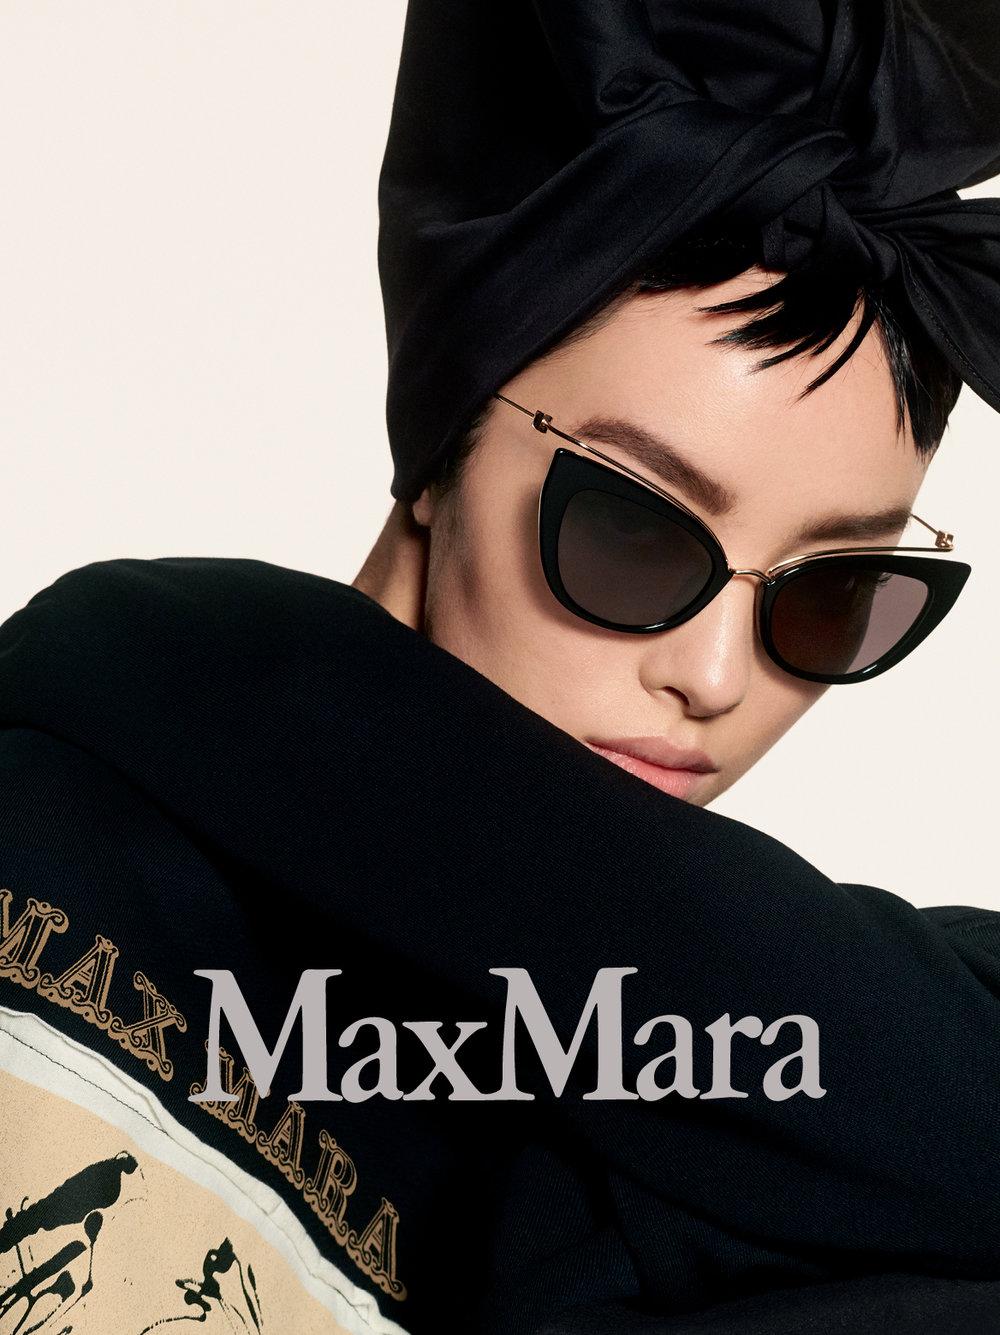 #maxmara #prefall18 #stevenmeisel #carineroitfeld #feifei #fashion #eyewear #campaign #jimkaemmerling #patmcgrath #guidopalau